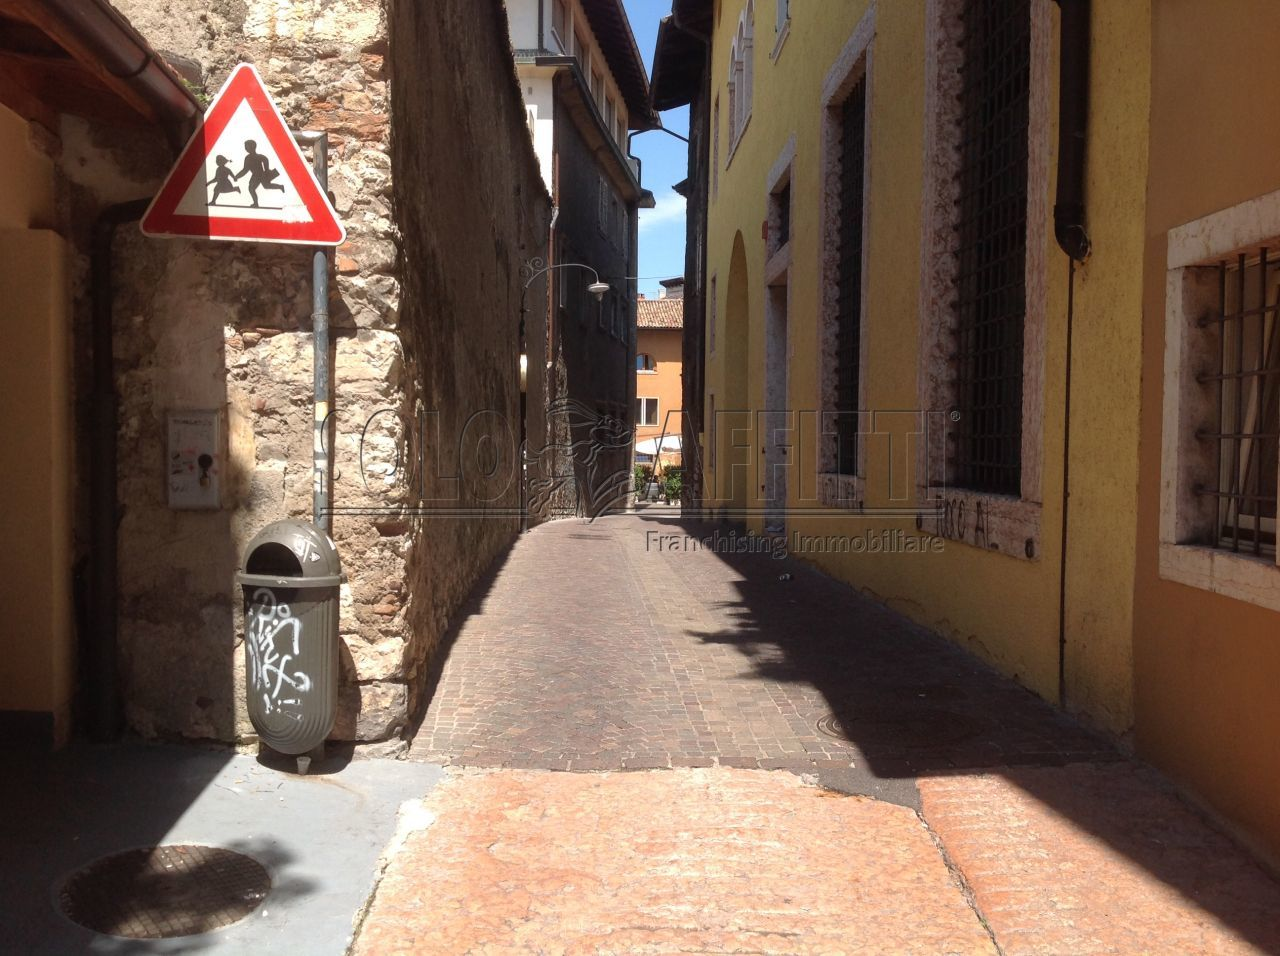 Bilocale Trento Via Don Arcangelo Rizzi 1 3